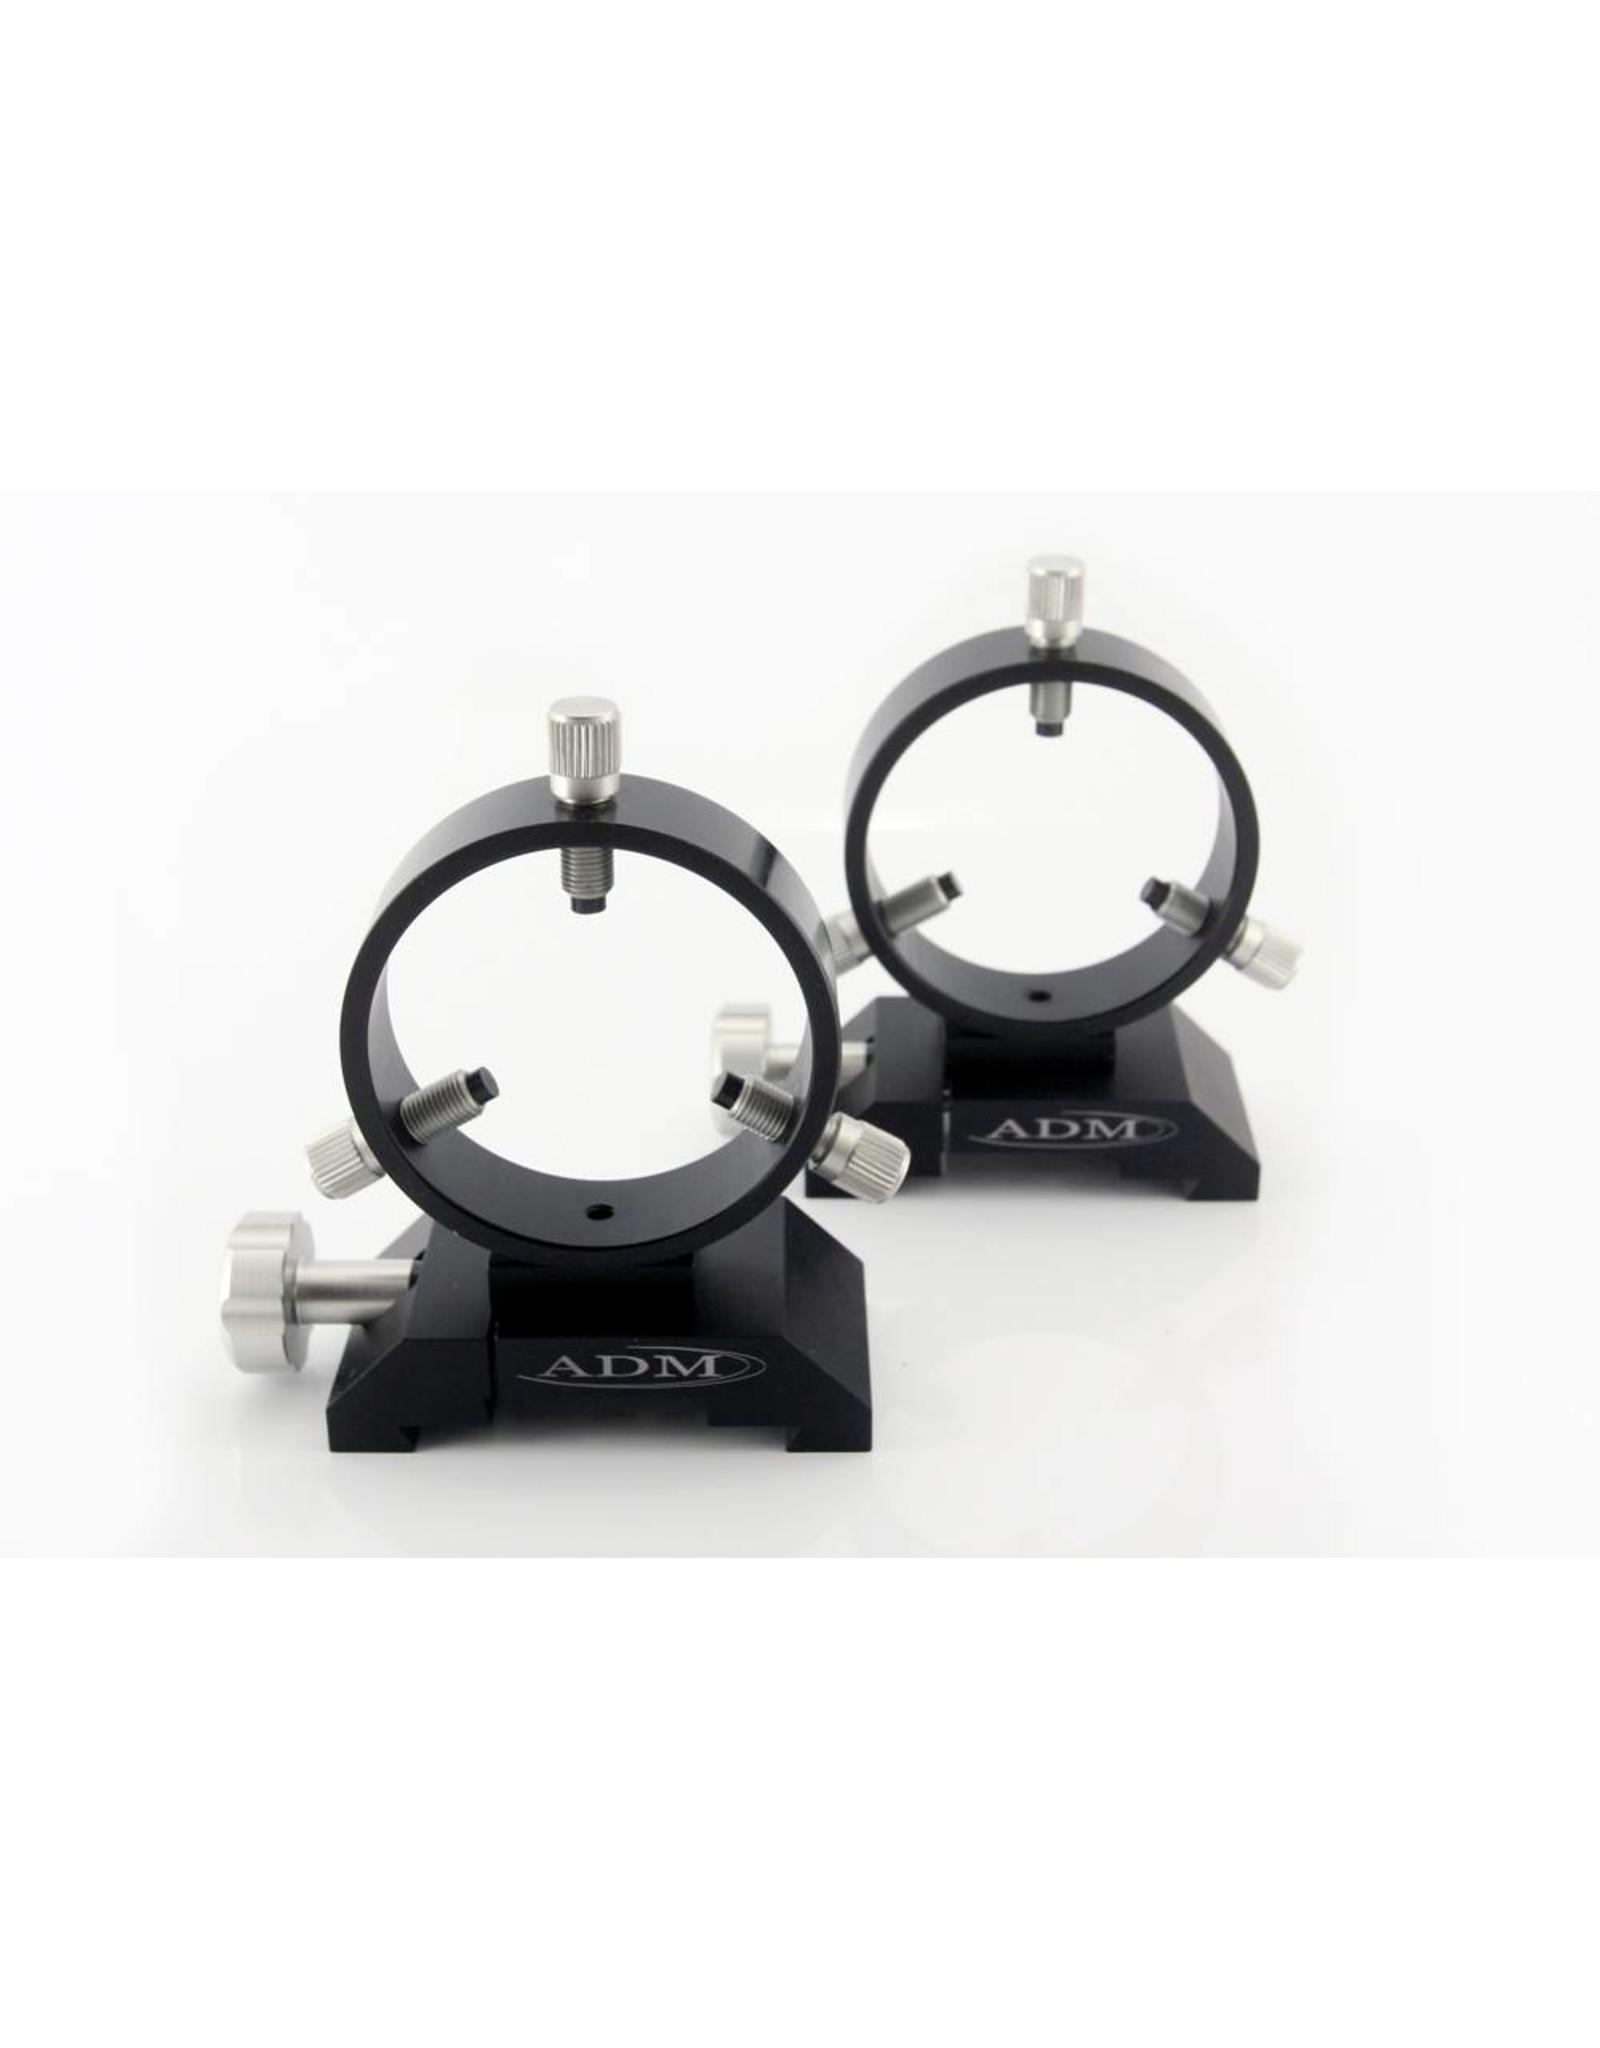 ADM ADM DV Series Dovetail Ring Set